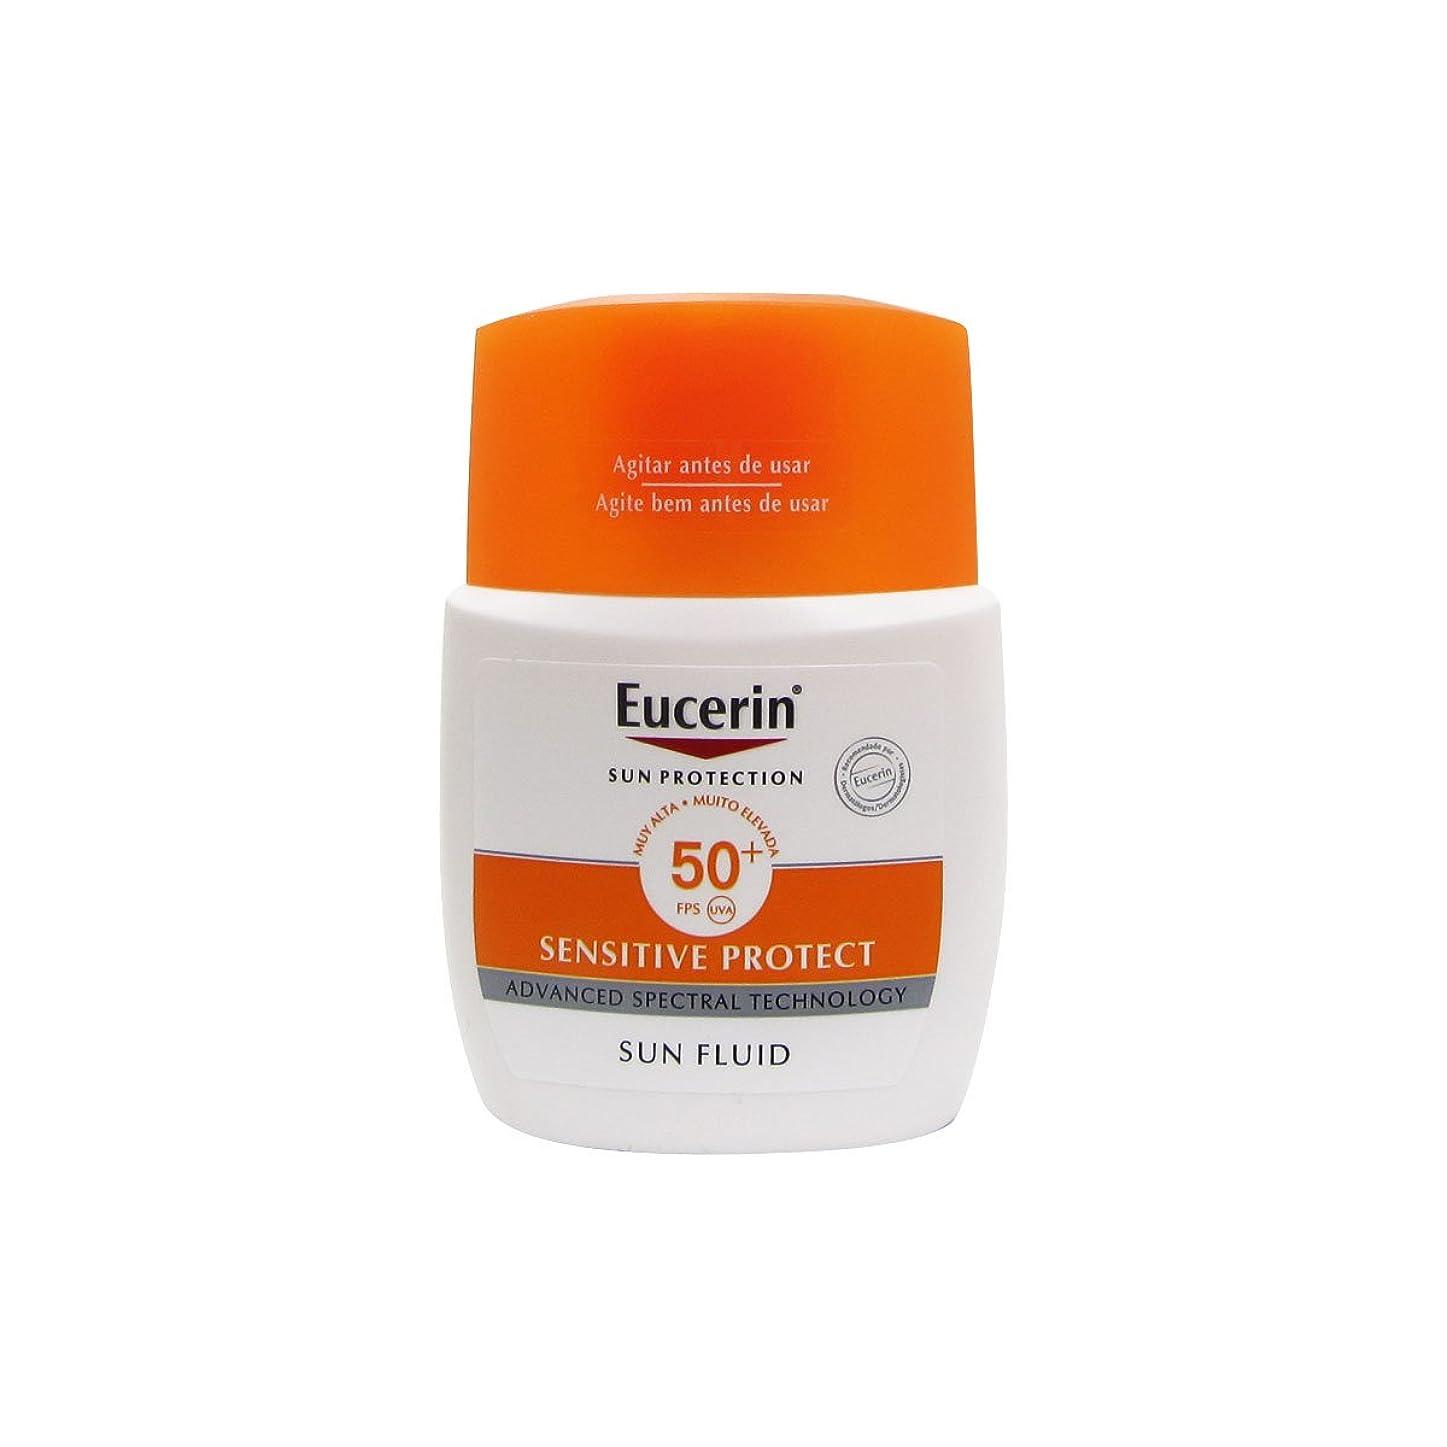 平和的期限切れ襟Eucerin Sun Mattifying Fluid Spf50+ 50ml [並行輸入品]